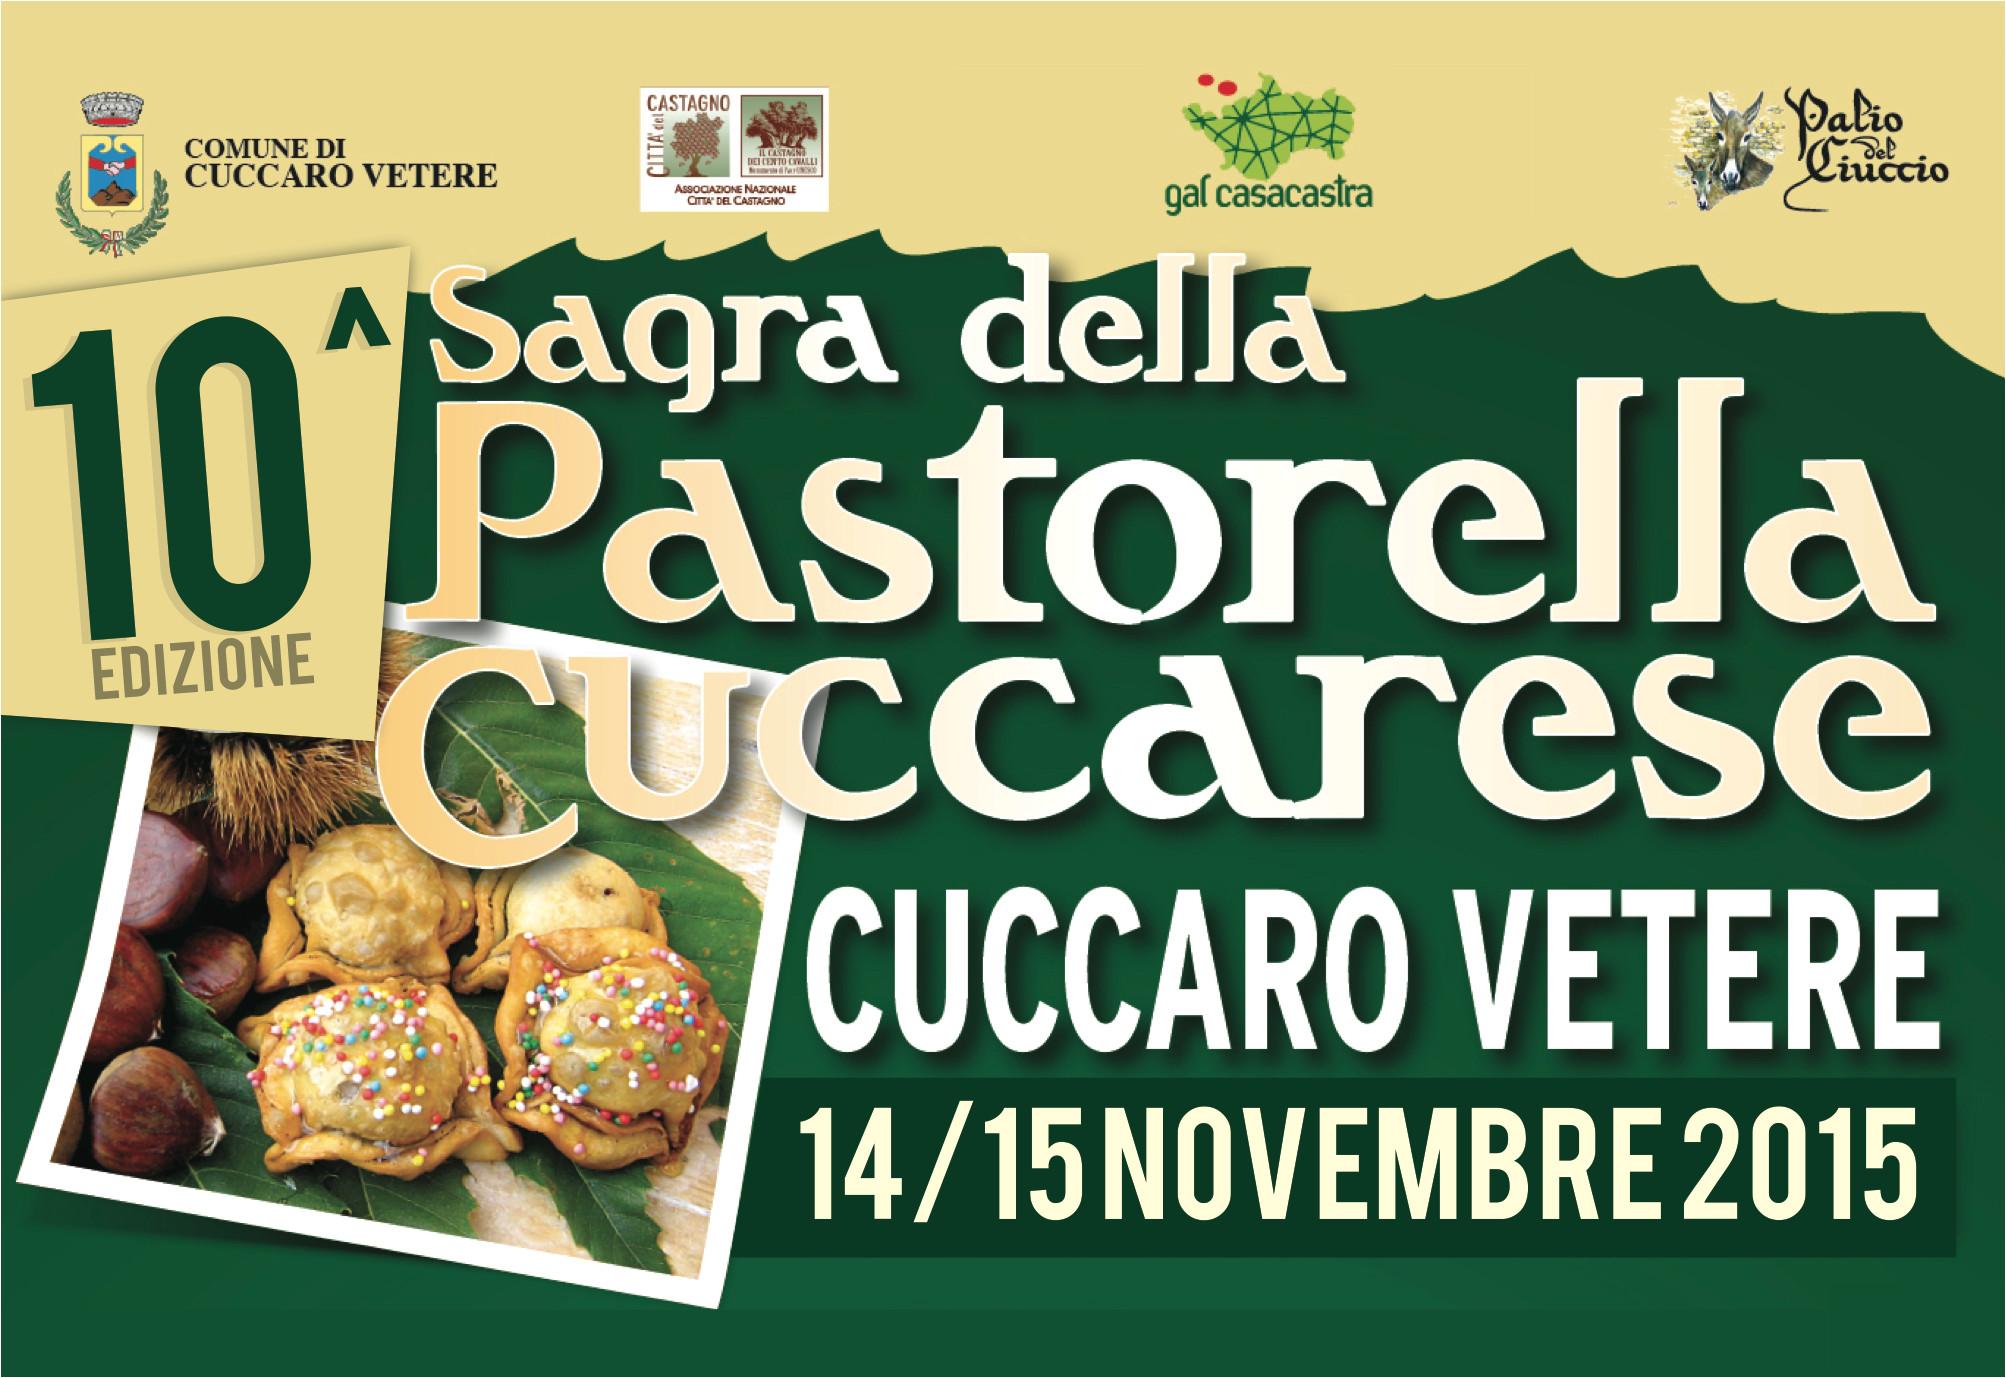 10 sagra della pastorella cuccarese 14 15 novembre 2015